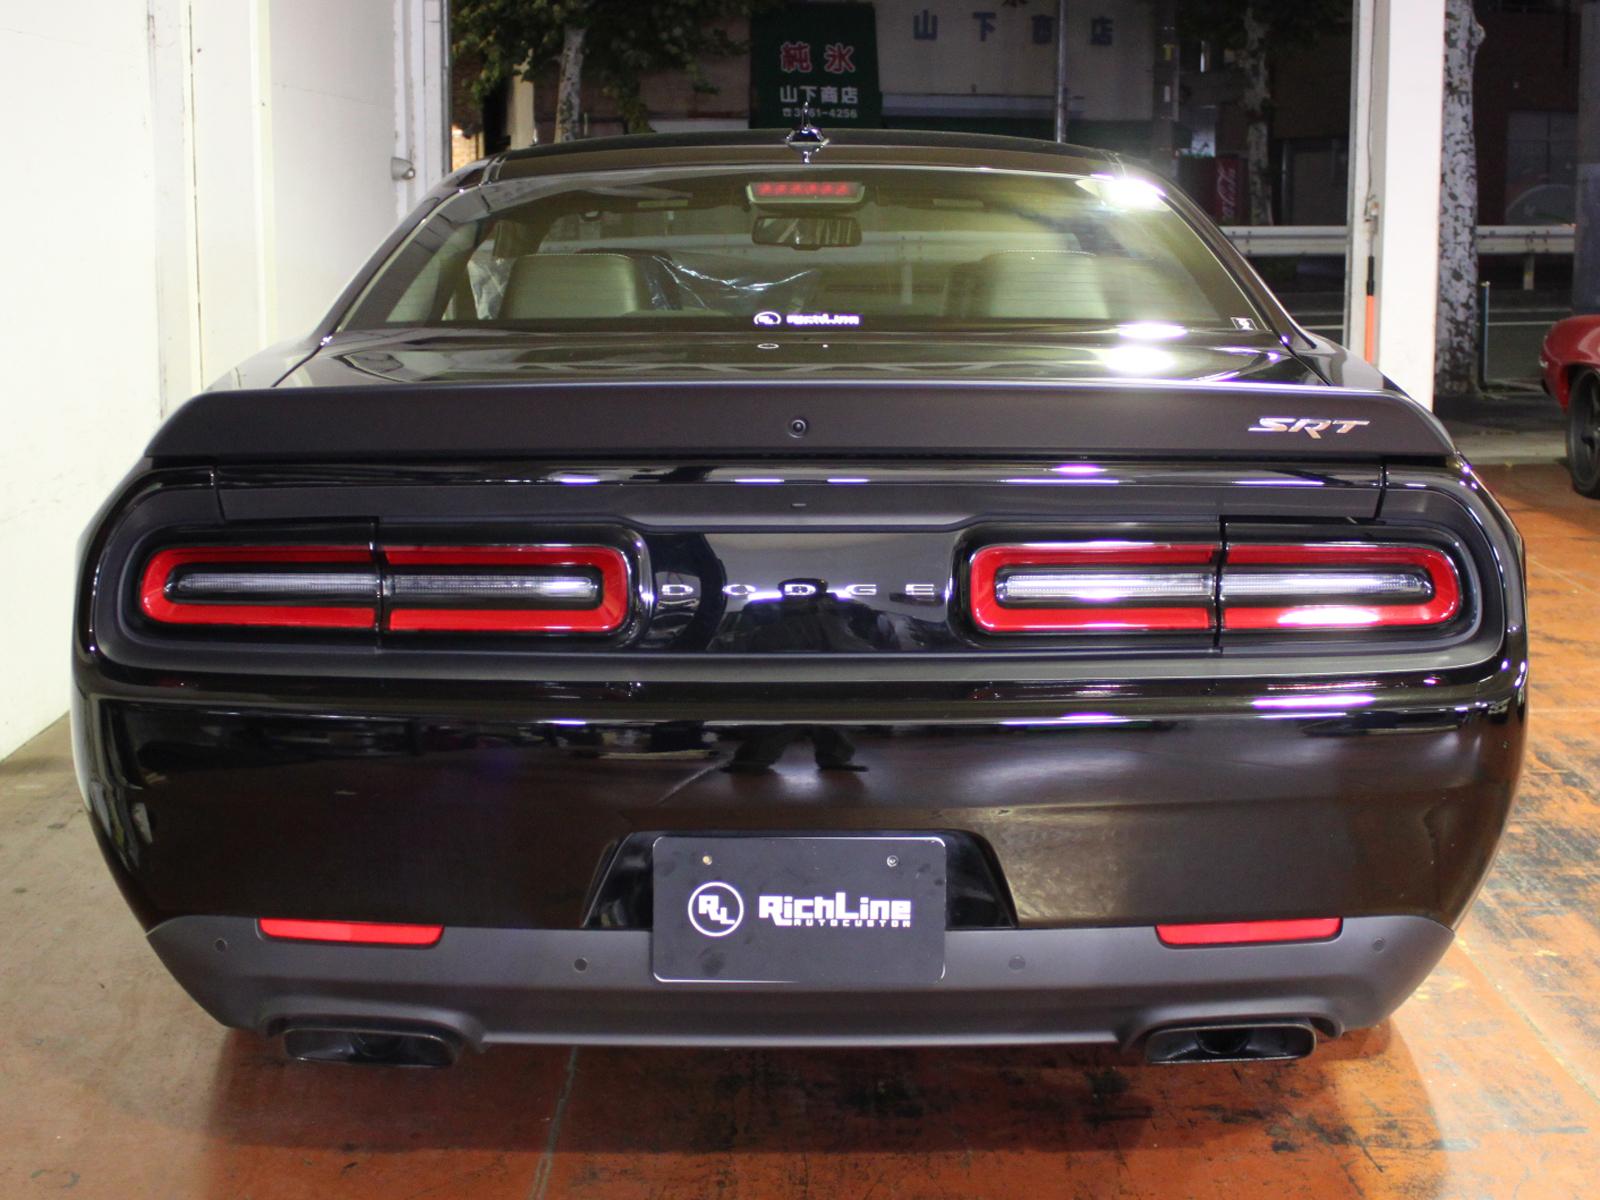 Challenger SRT Hellcatリッチライン